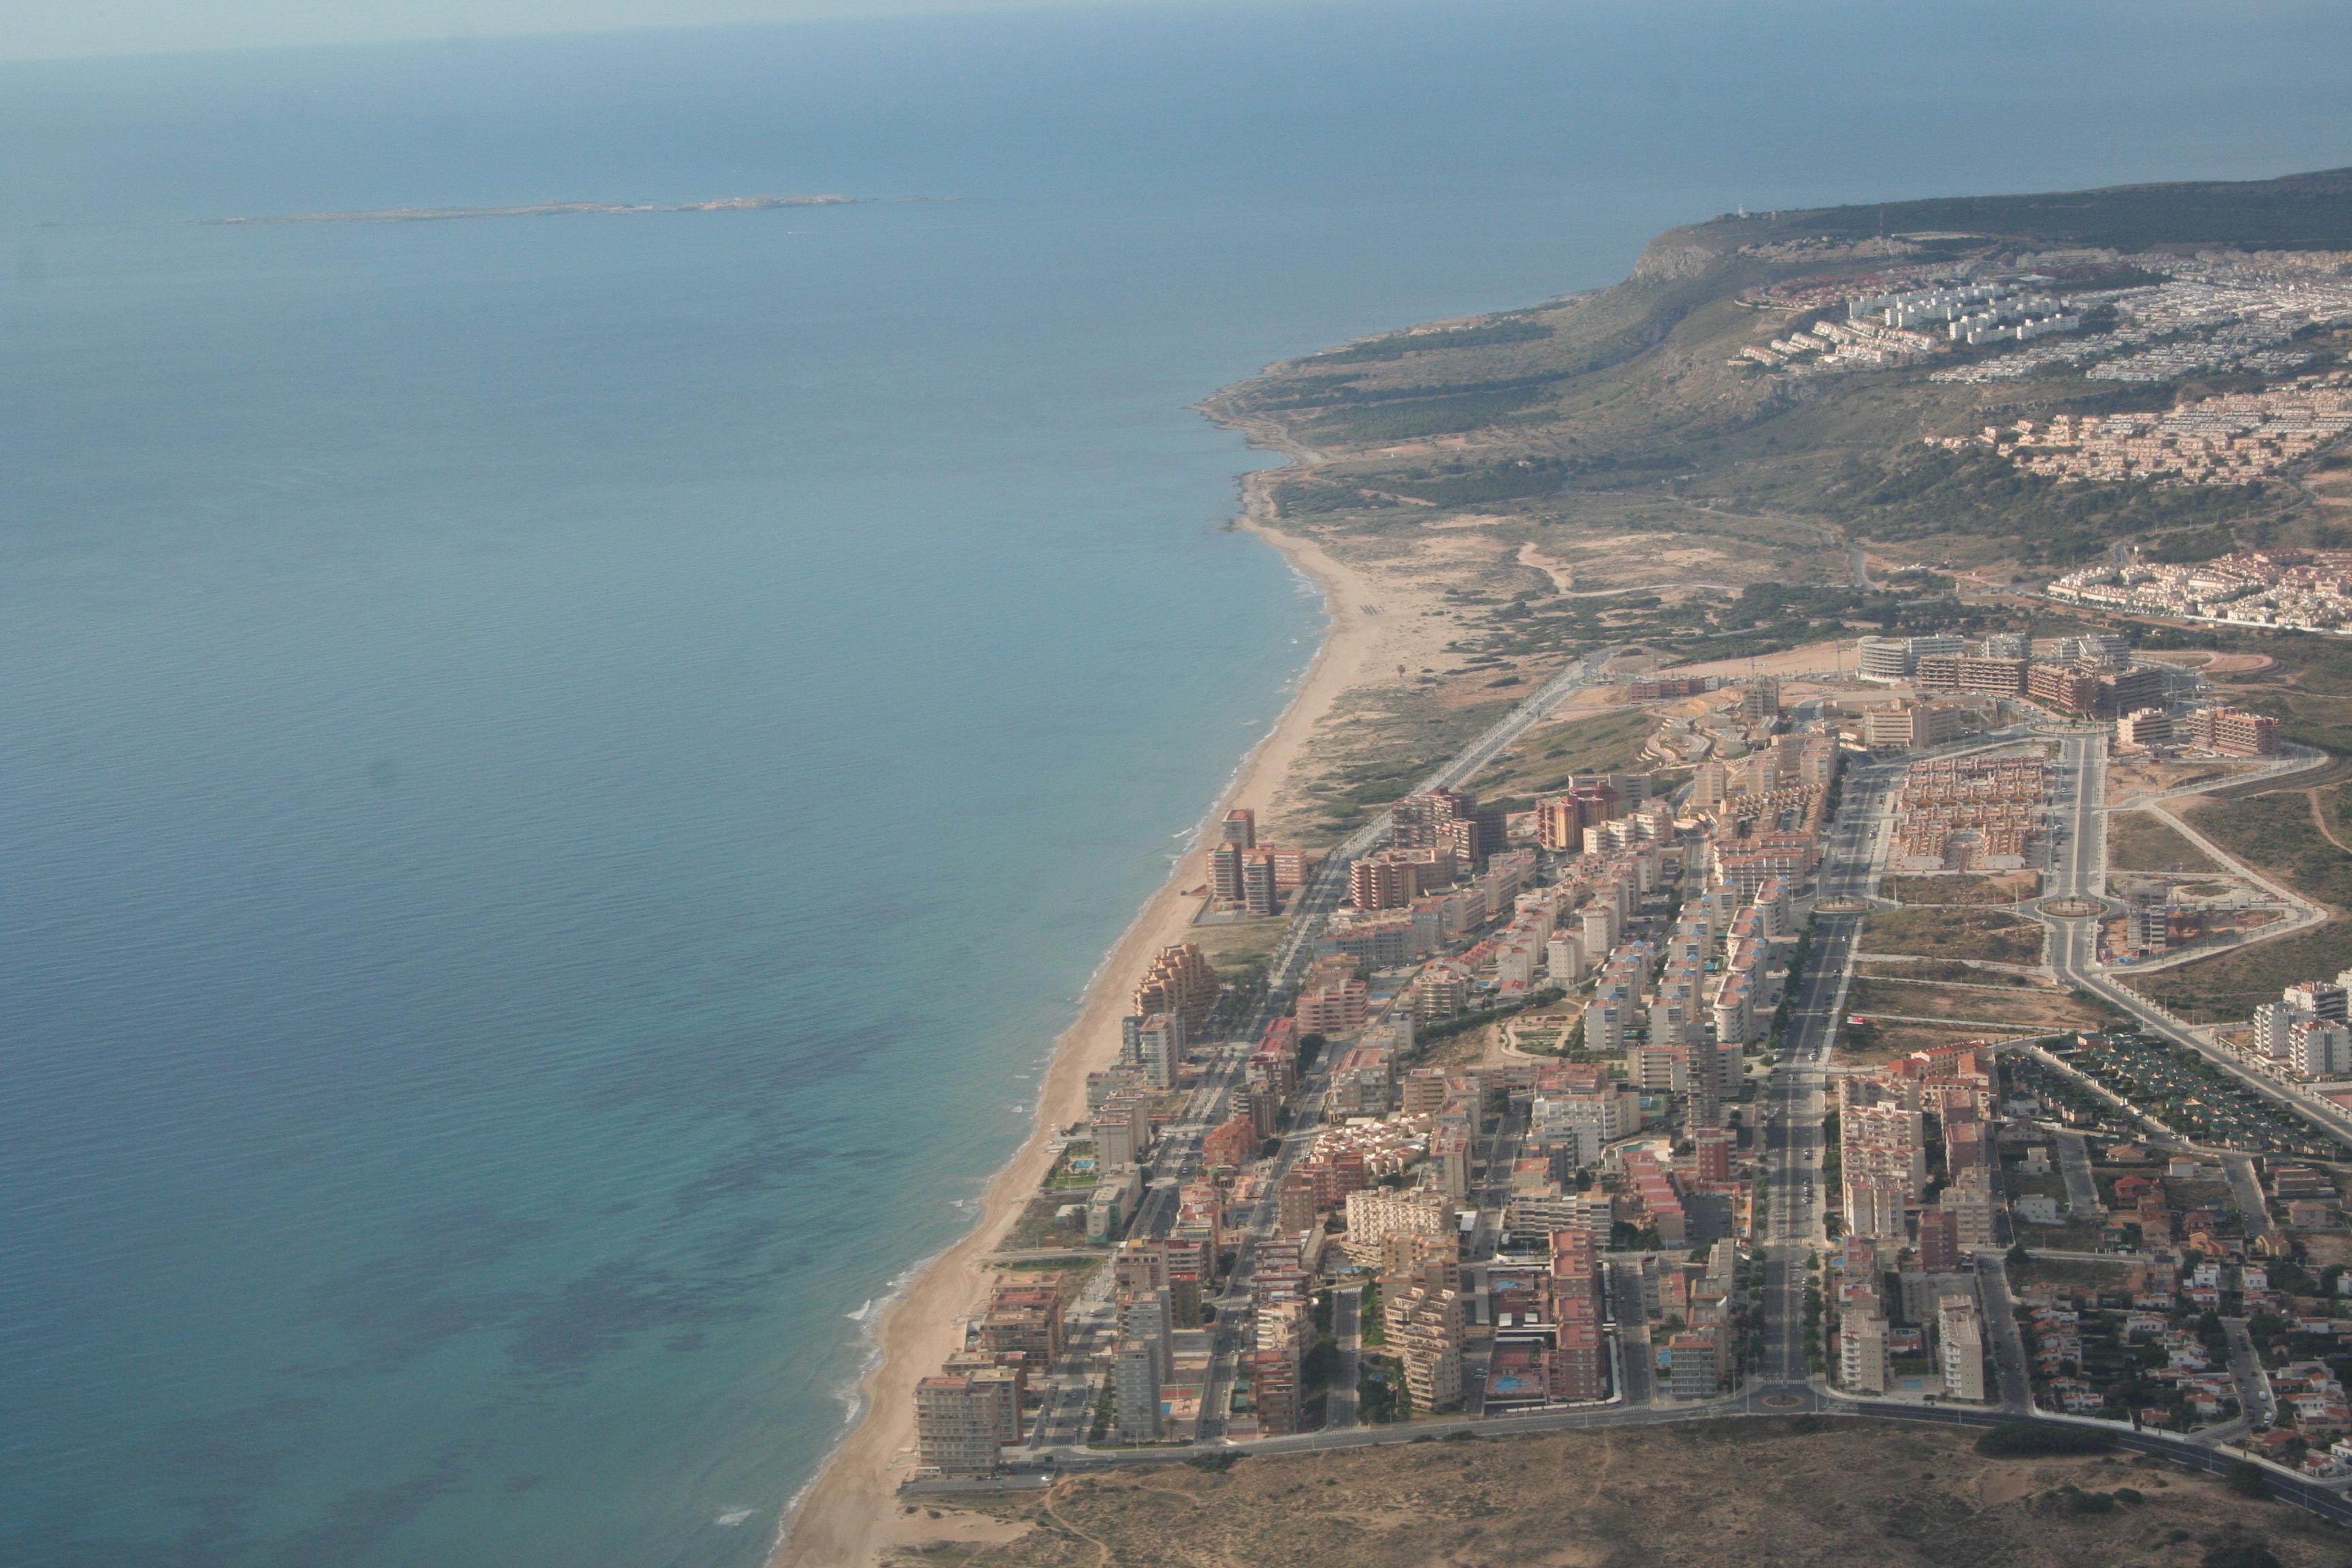 Playa Los Saladares / Urbanova